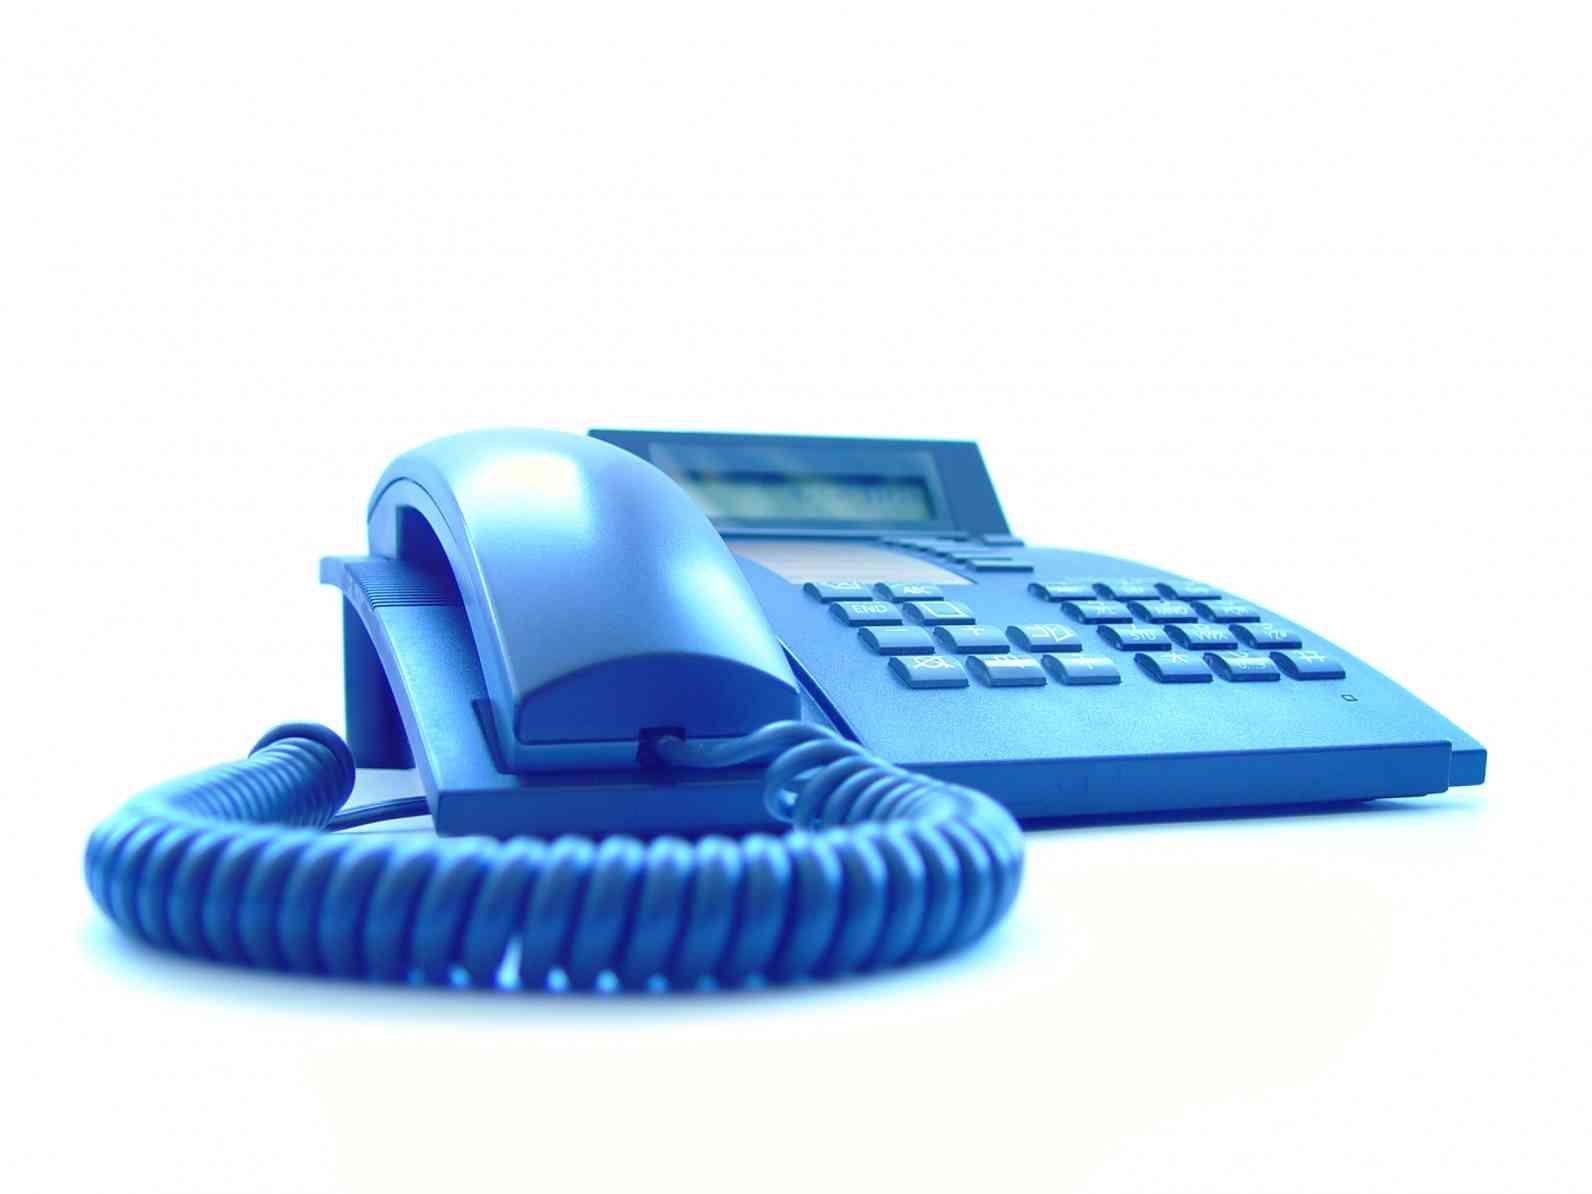 landline phones Wildfire Phones Ltd business landlines